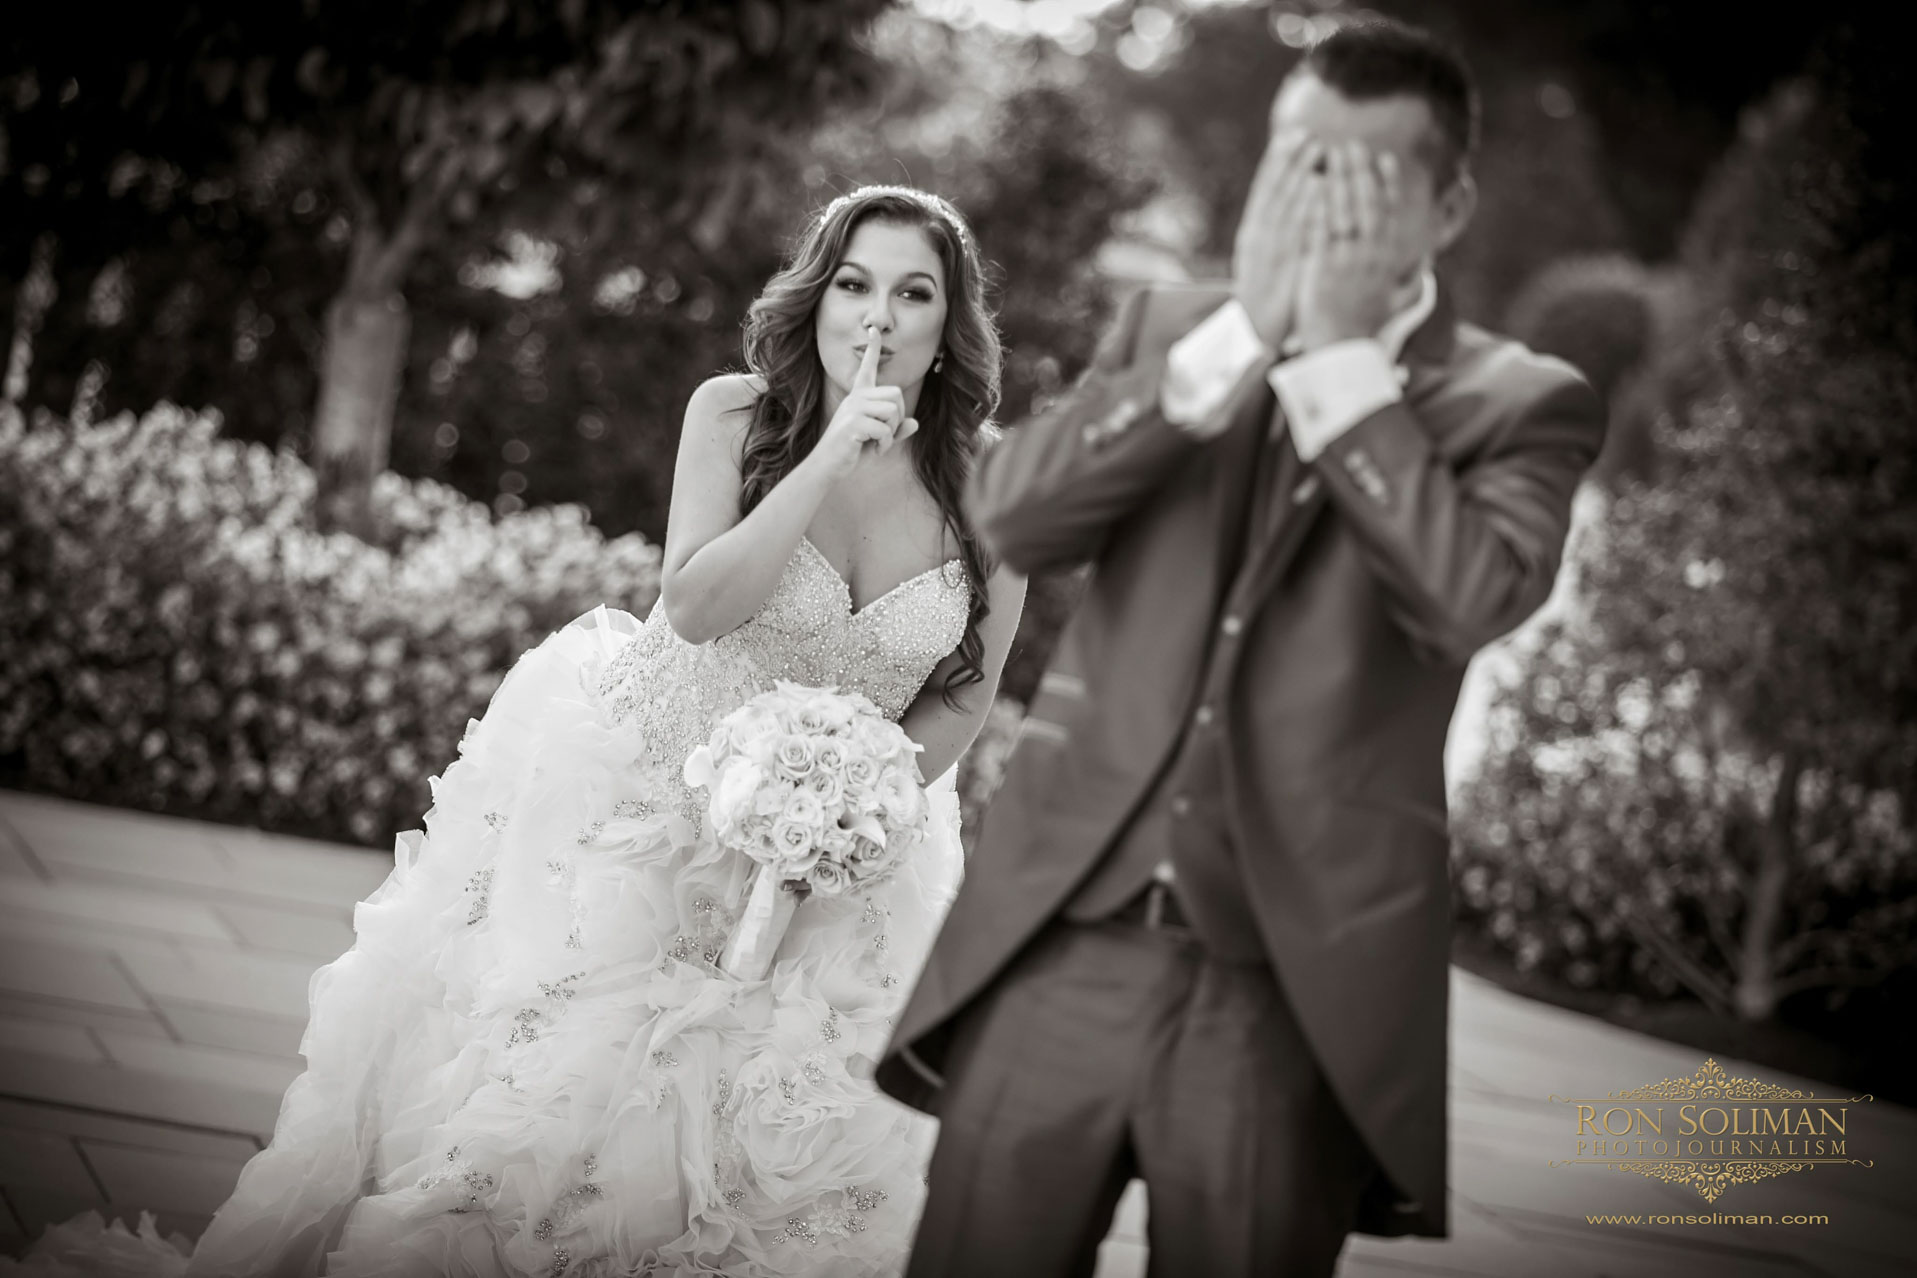 Best wedding photos at The Palace at Somerset Park